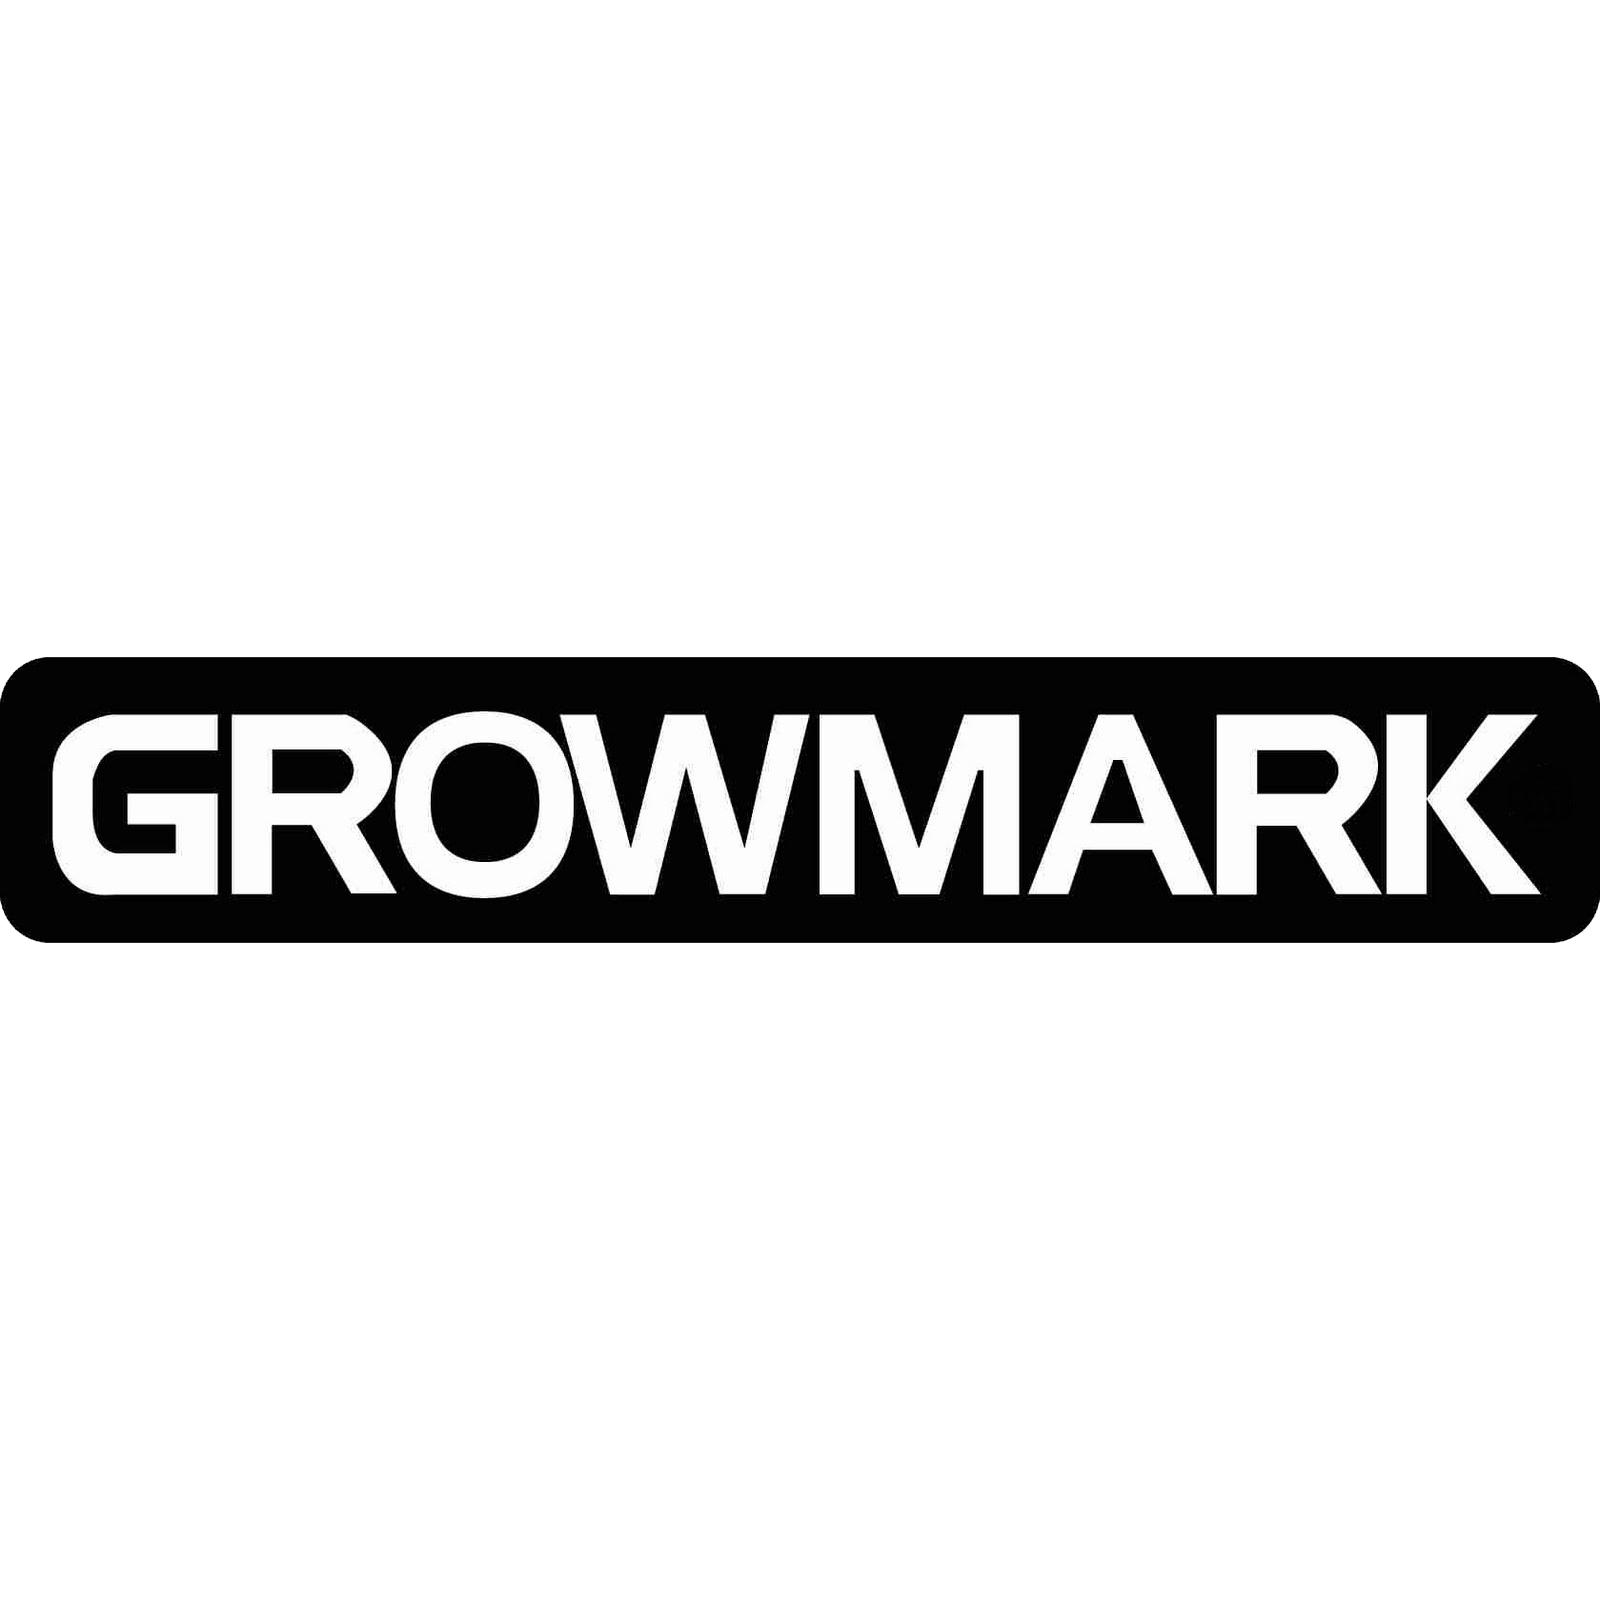 HR_GROWMARK_black_border_no_R_.jpg